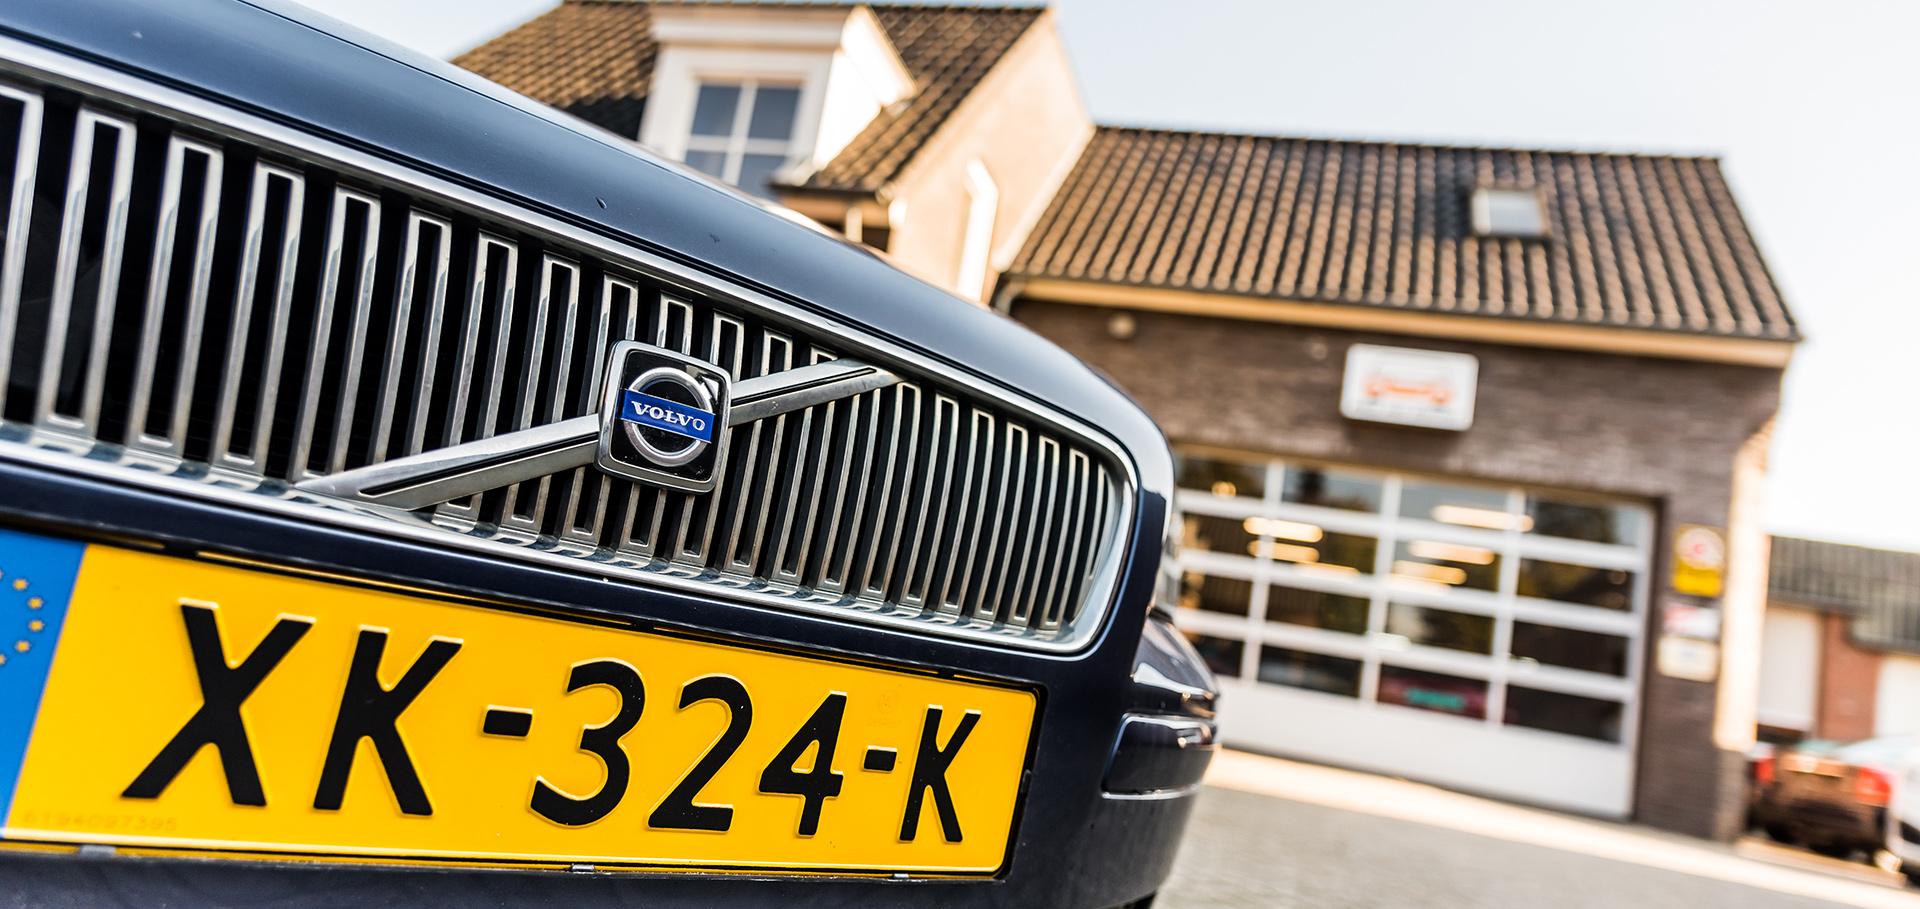 Volvo specialist Milheeze